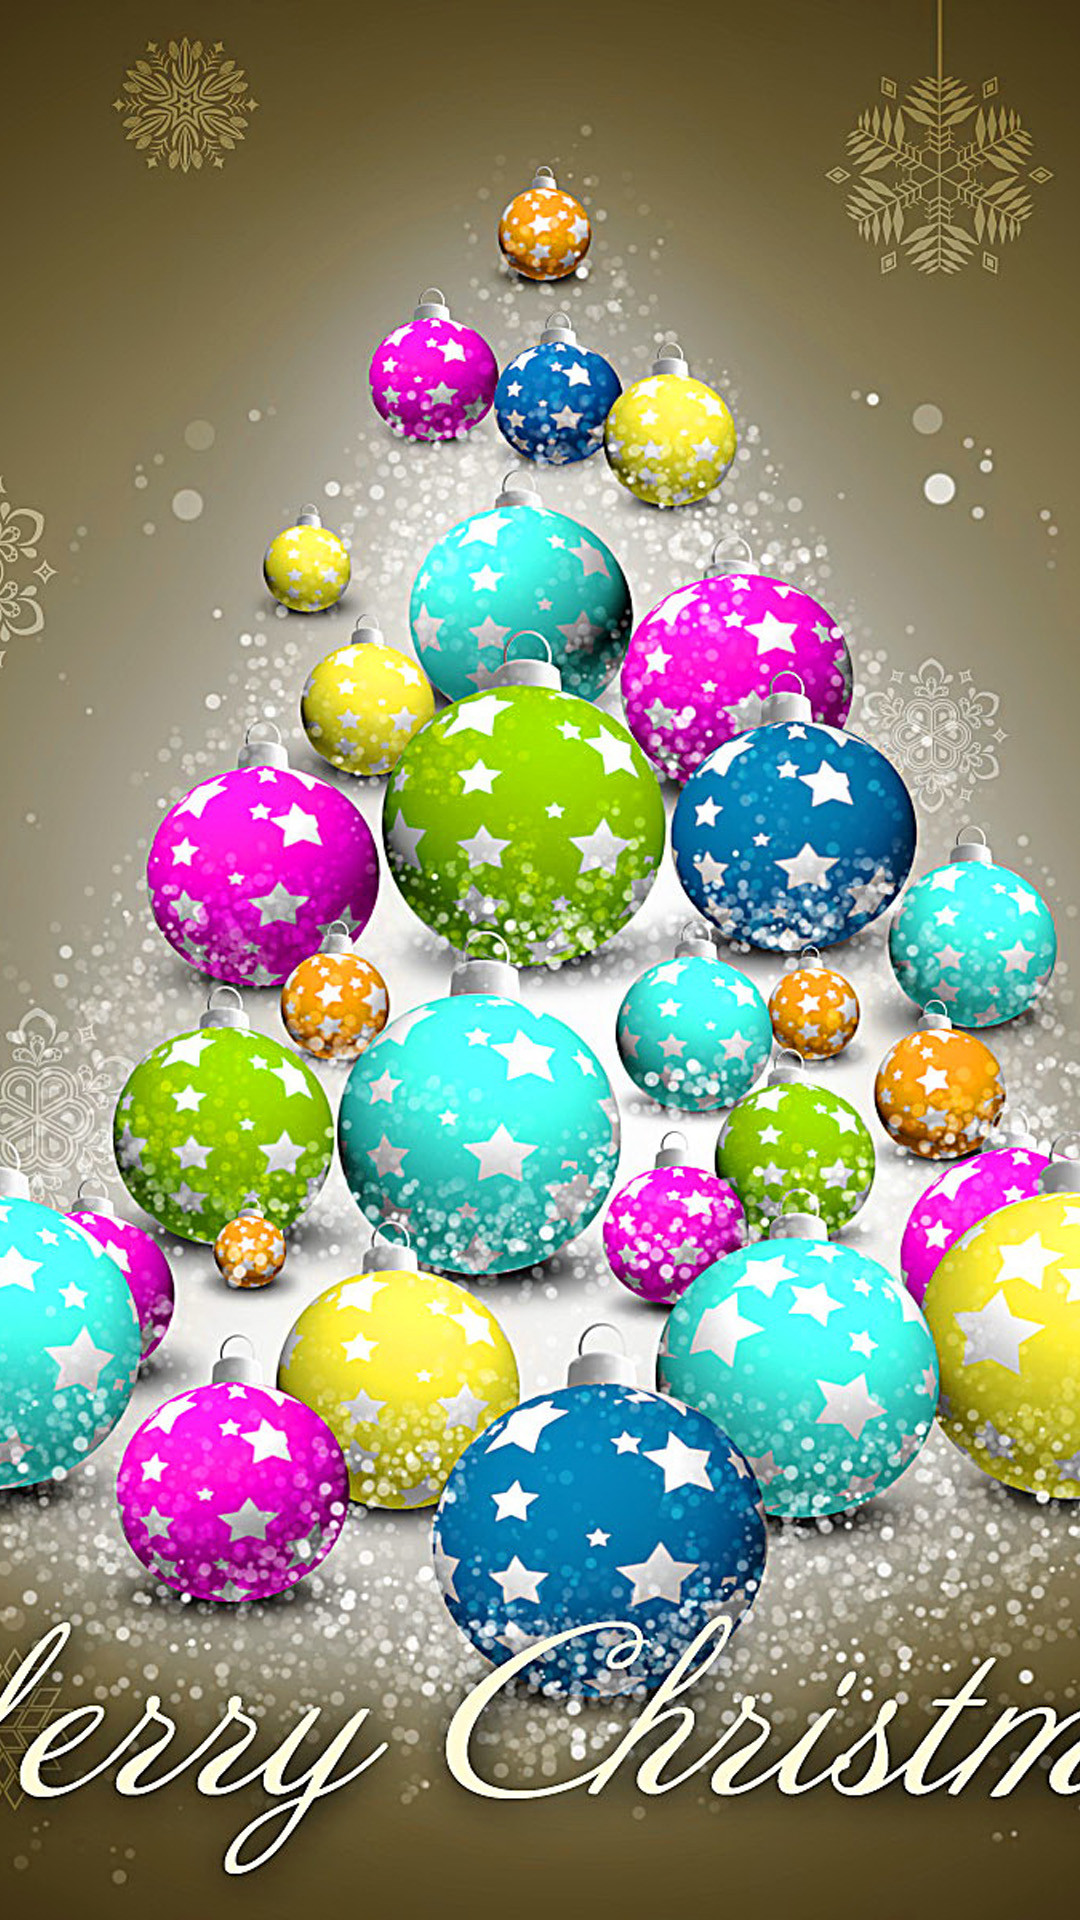 Christmas Iphone 6 Plus Wallpaper - Christmas Wallpaper Desktop Bright Colors - HD Wallpaper